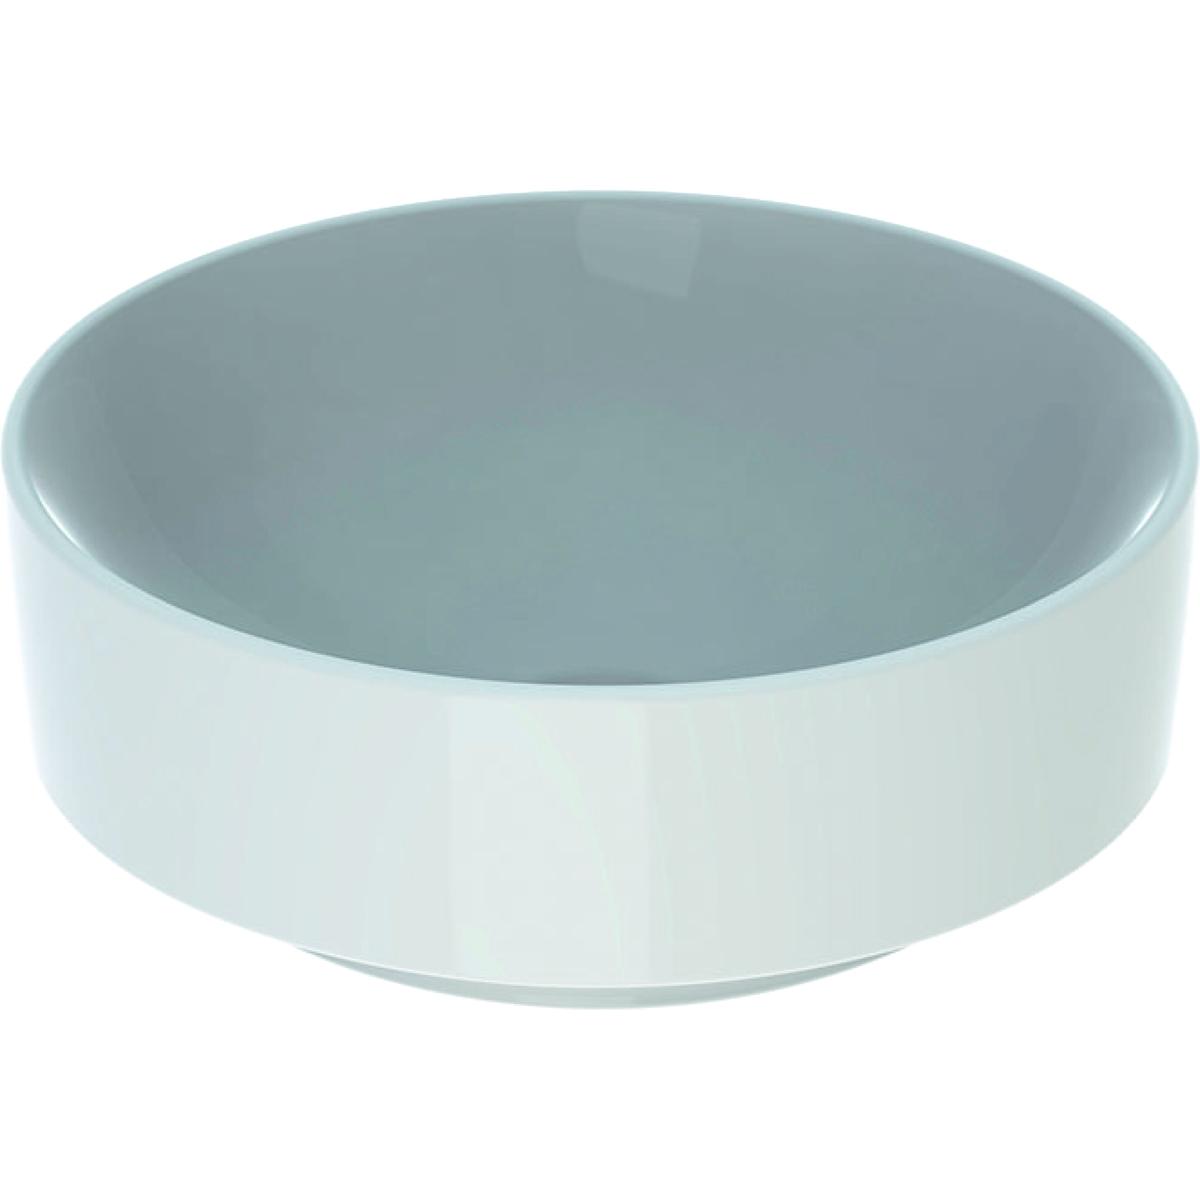 Lavoar rotund tip bol Geberit VariForm 40cm fara orificiu baterie fara preaplin alb imagine